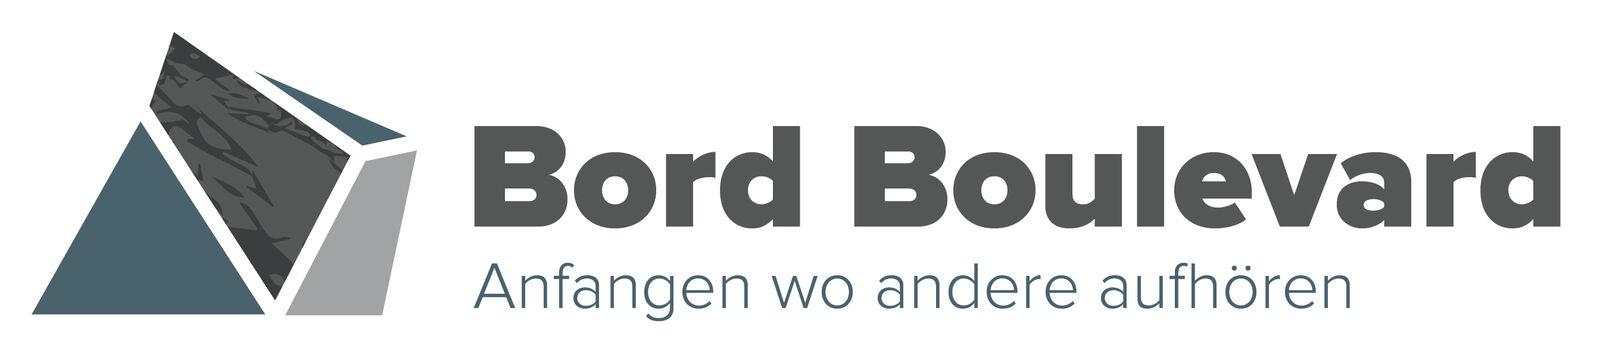 Board Boulevard